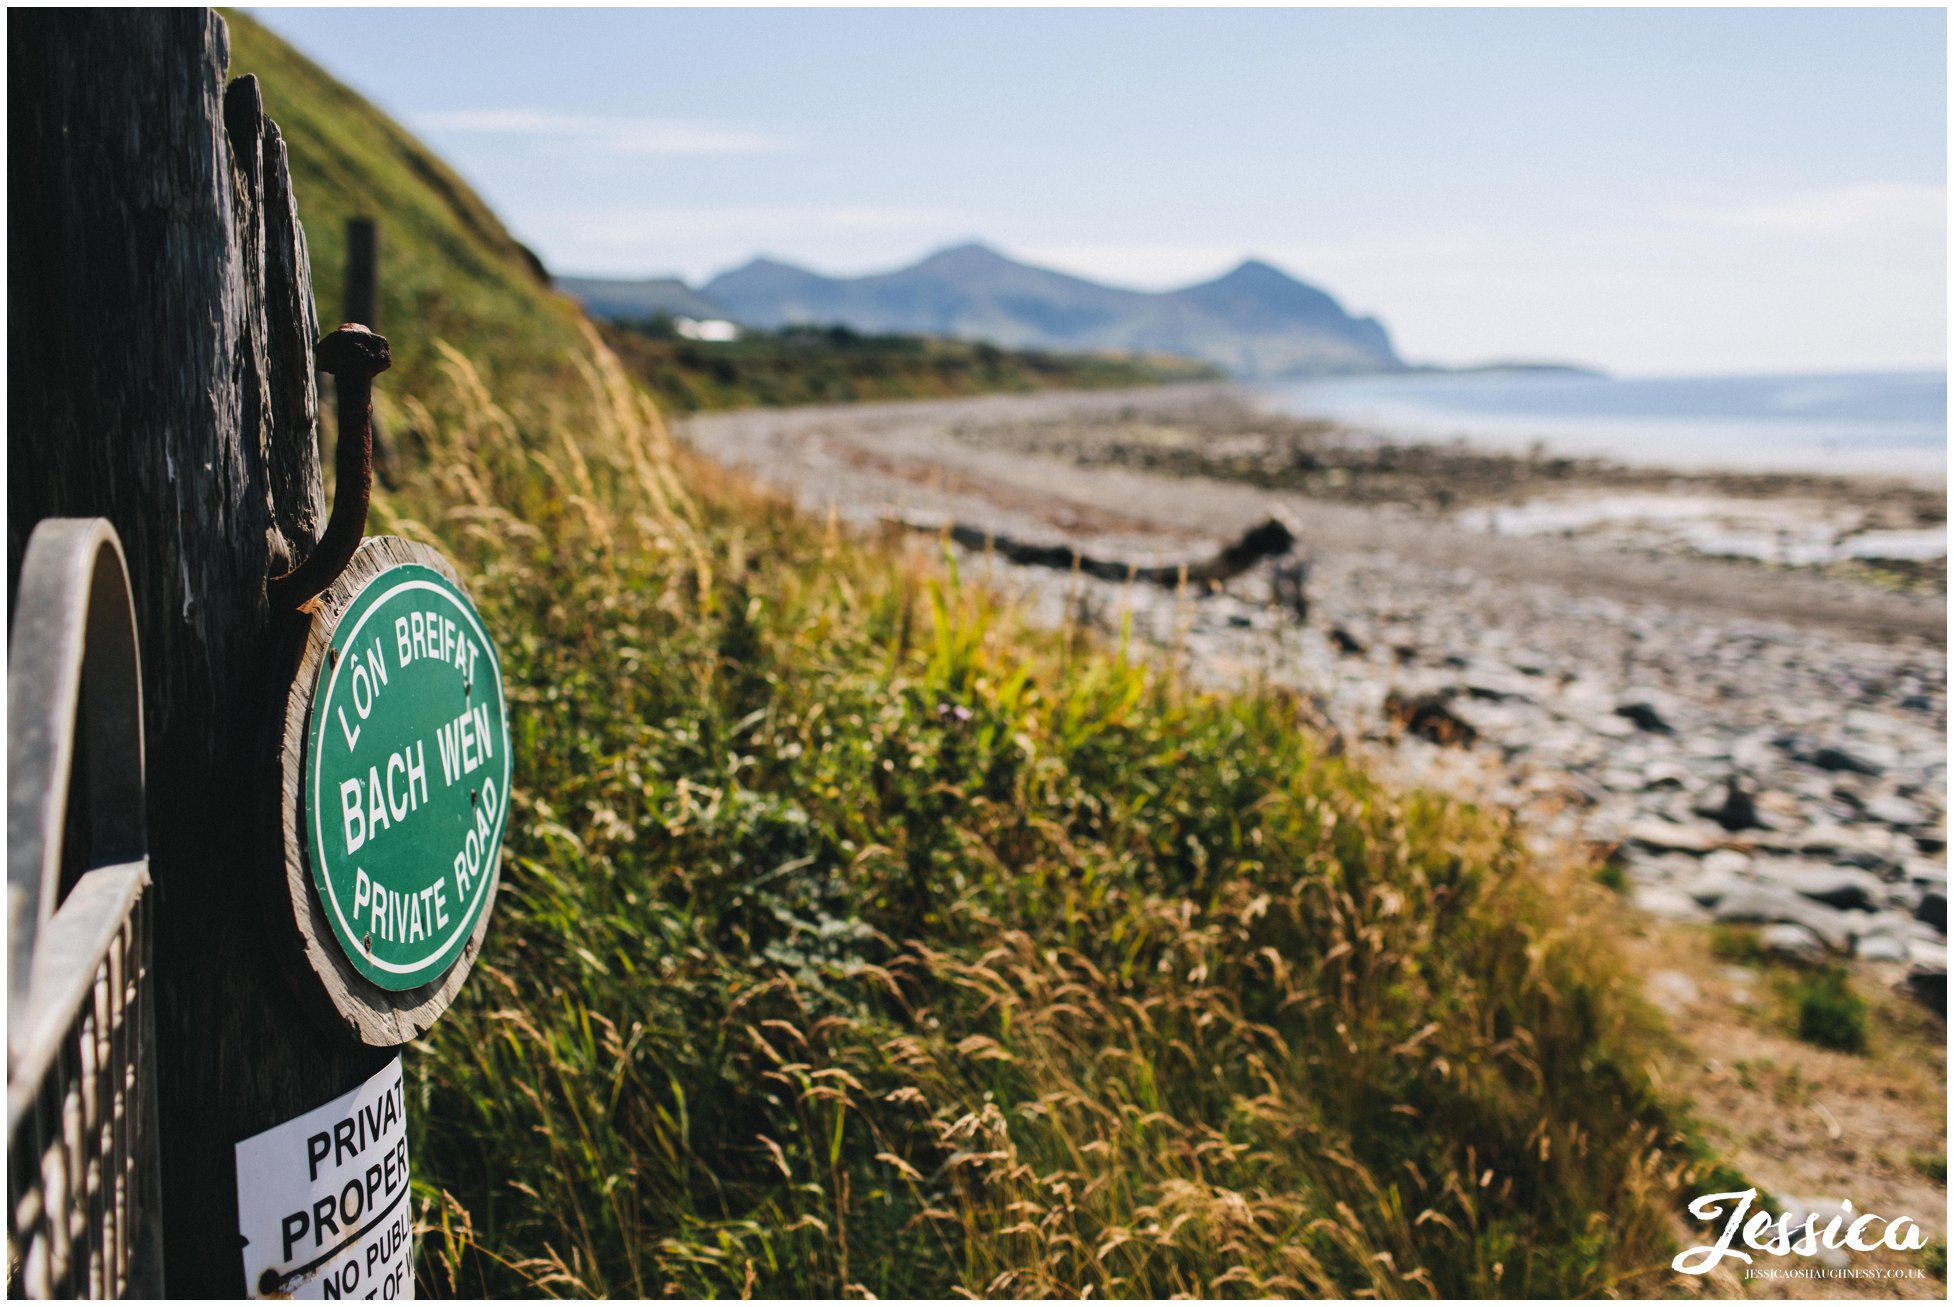 Bach Wen Farm signpost on Caernarfon bay beach